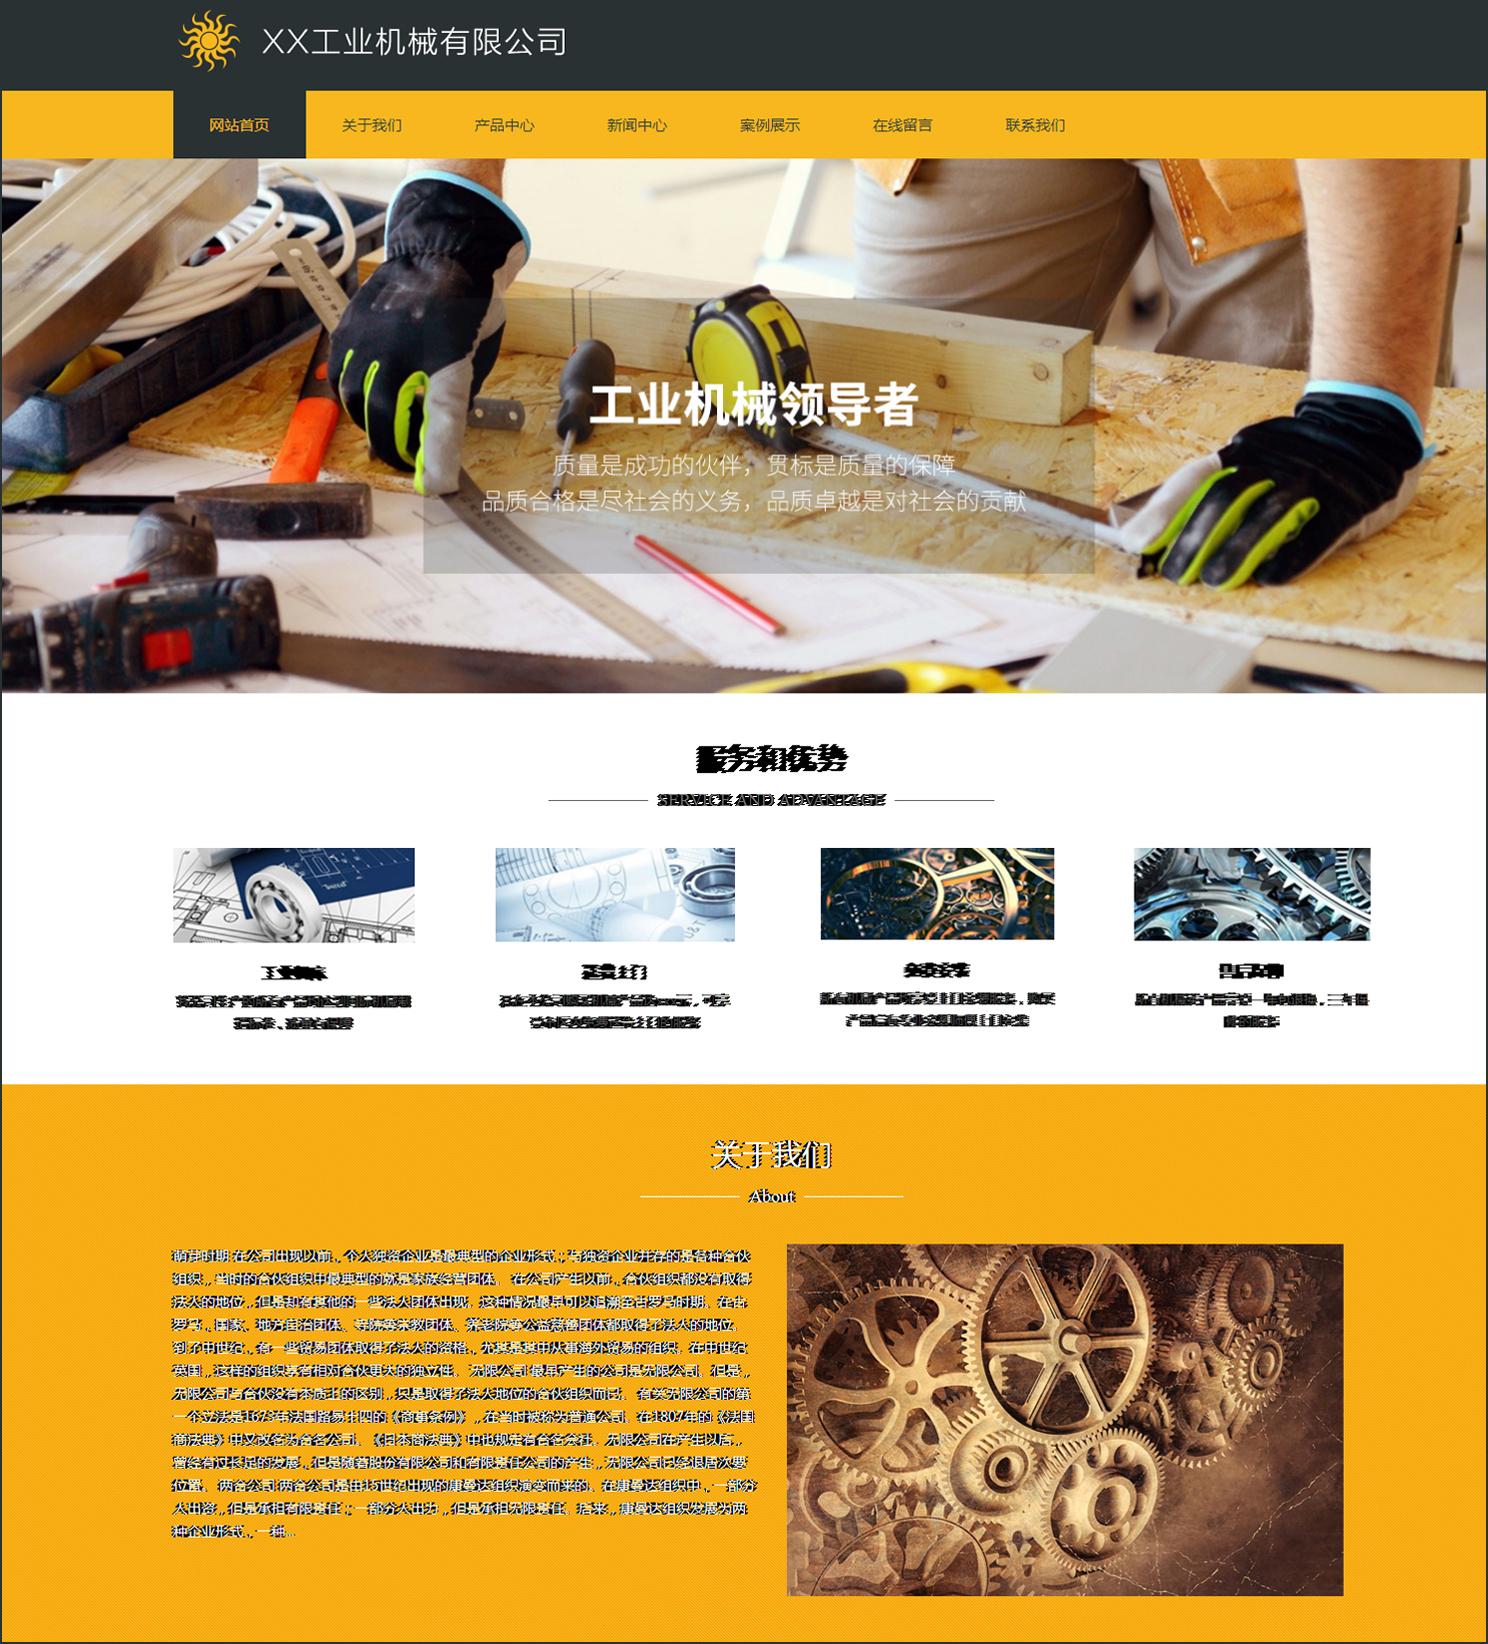 DEDECMS响应式工业机械网站源码 PHP织梦模